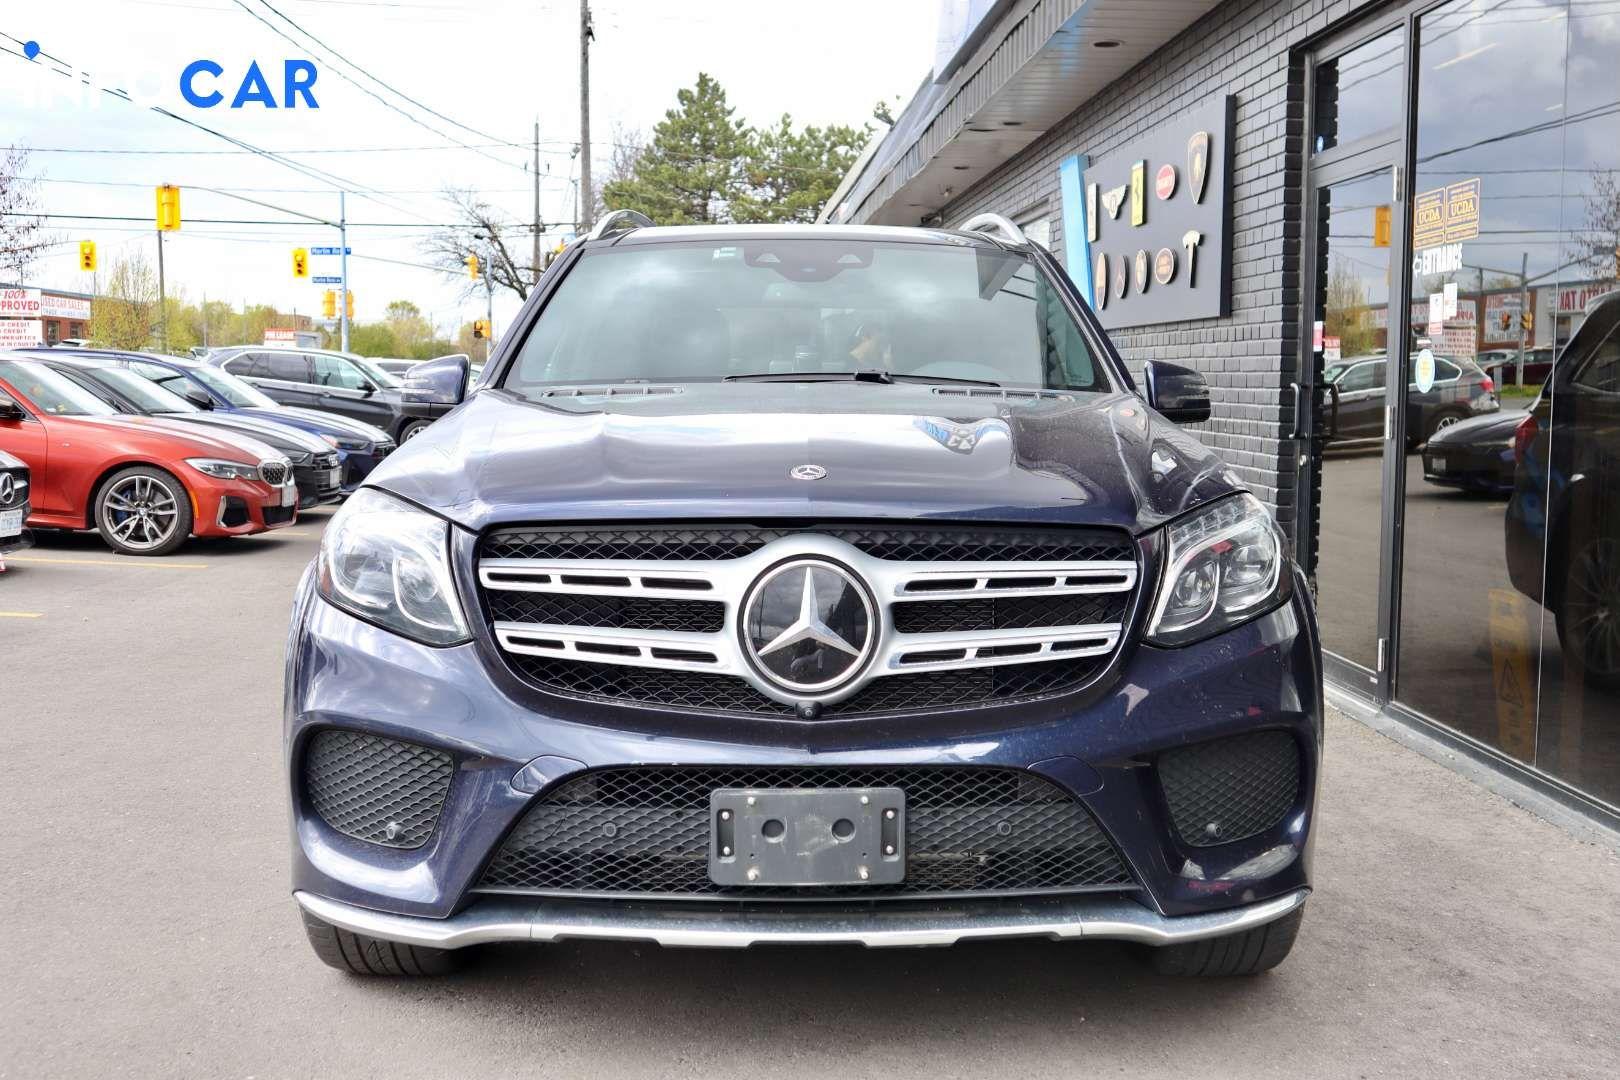 2018 Mercedes-Benz GLS-Class GLS450 4MATIC - INFOCAR - Toronto's Most Comprehensive New and Used Auto Trading Platform